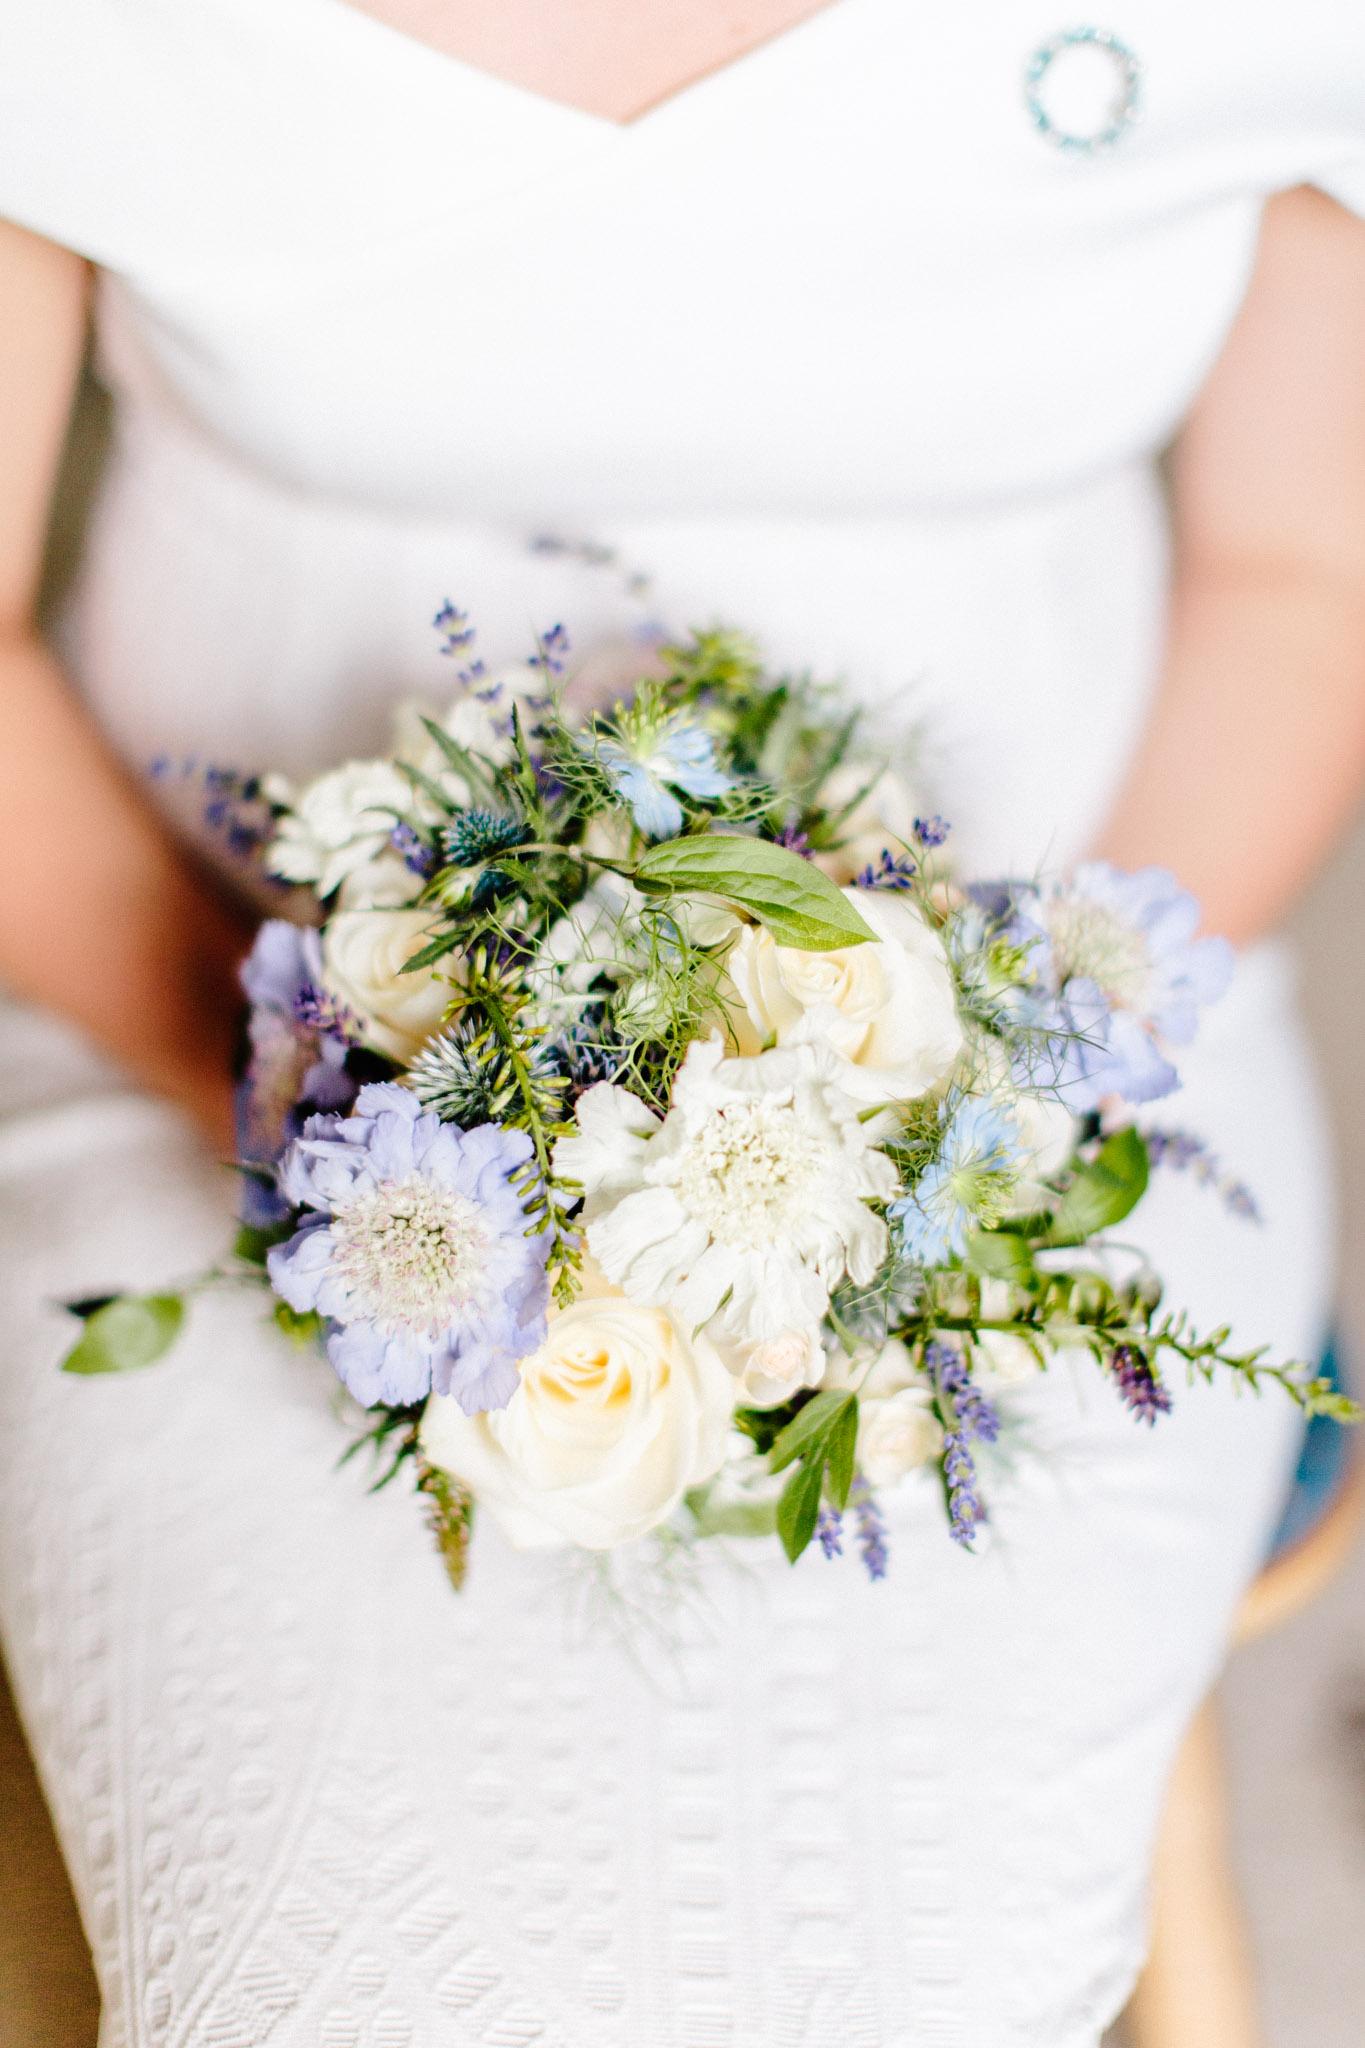 Lenl-Simmental-Buehlerhof-Pia-Anna-Christian-Wedding-Photography-EK-30.jpg